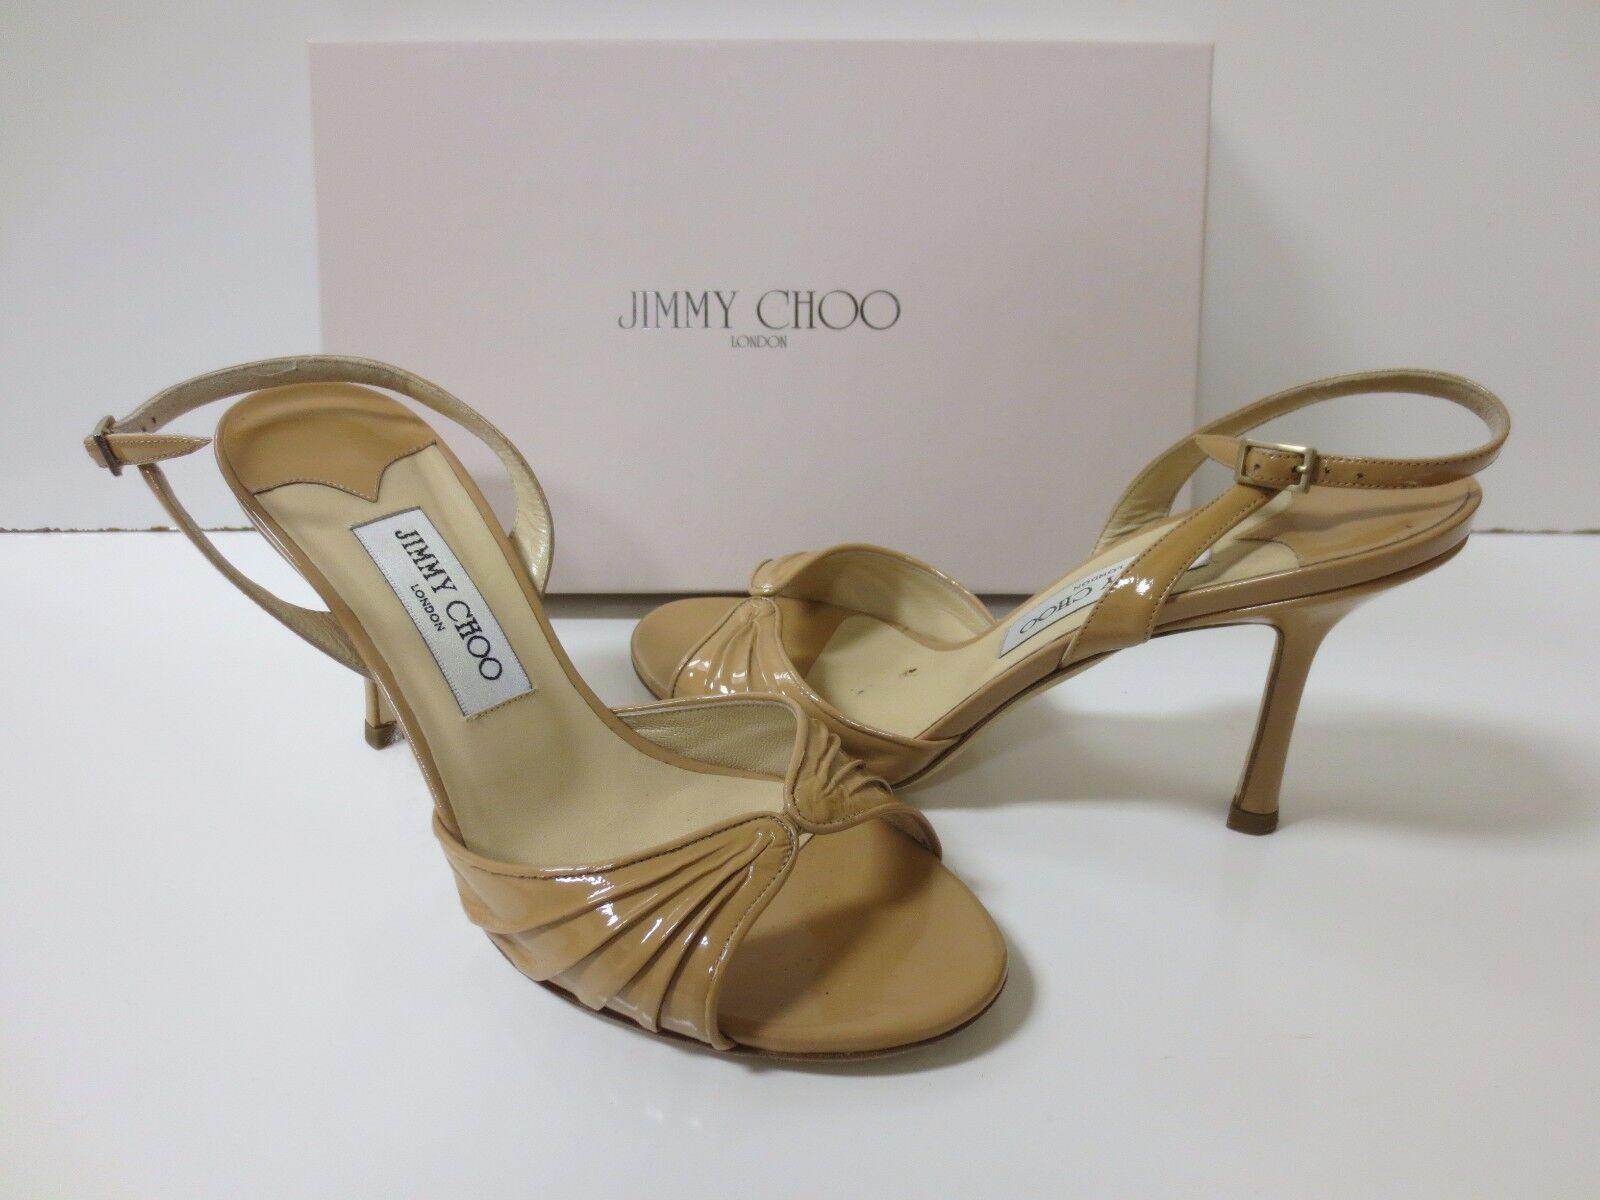 JIMMY CHOO Slingback KING Slingback CHOO Sandals Nude Patent Pelle Sz 38 EUC c78000